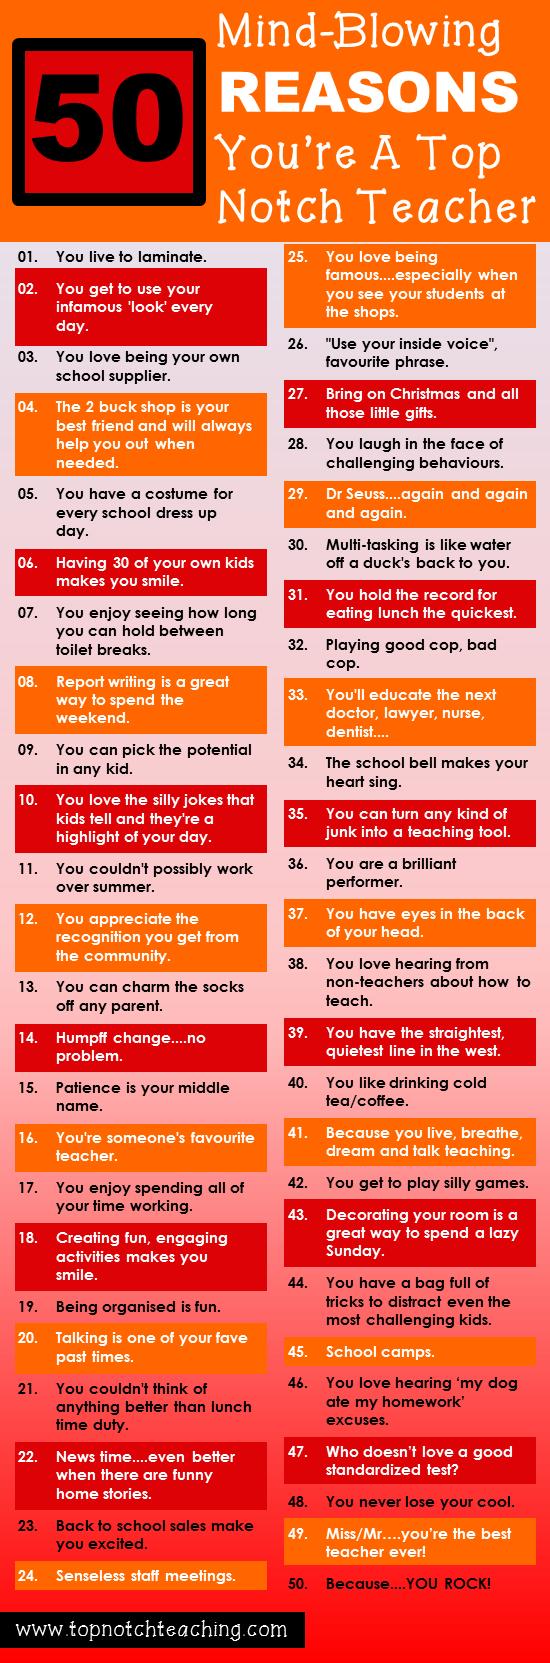 50 Mind-Blowing Reasons You're A Top Notch Teacher